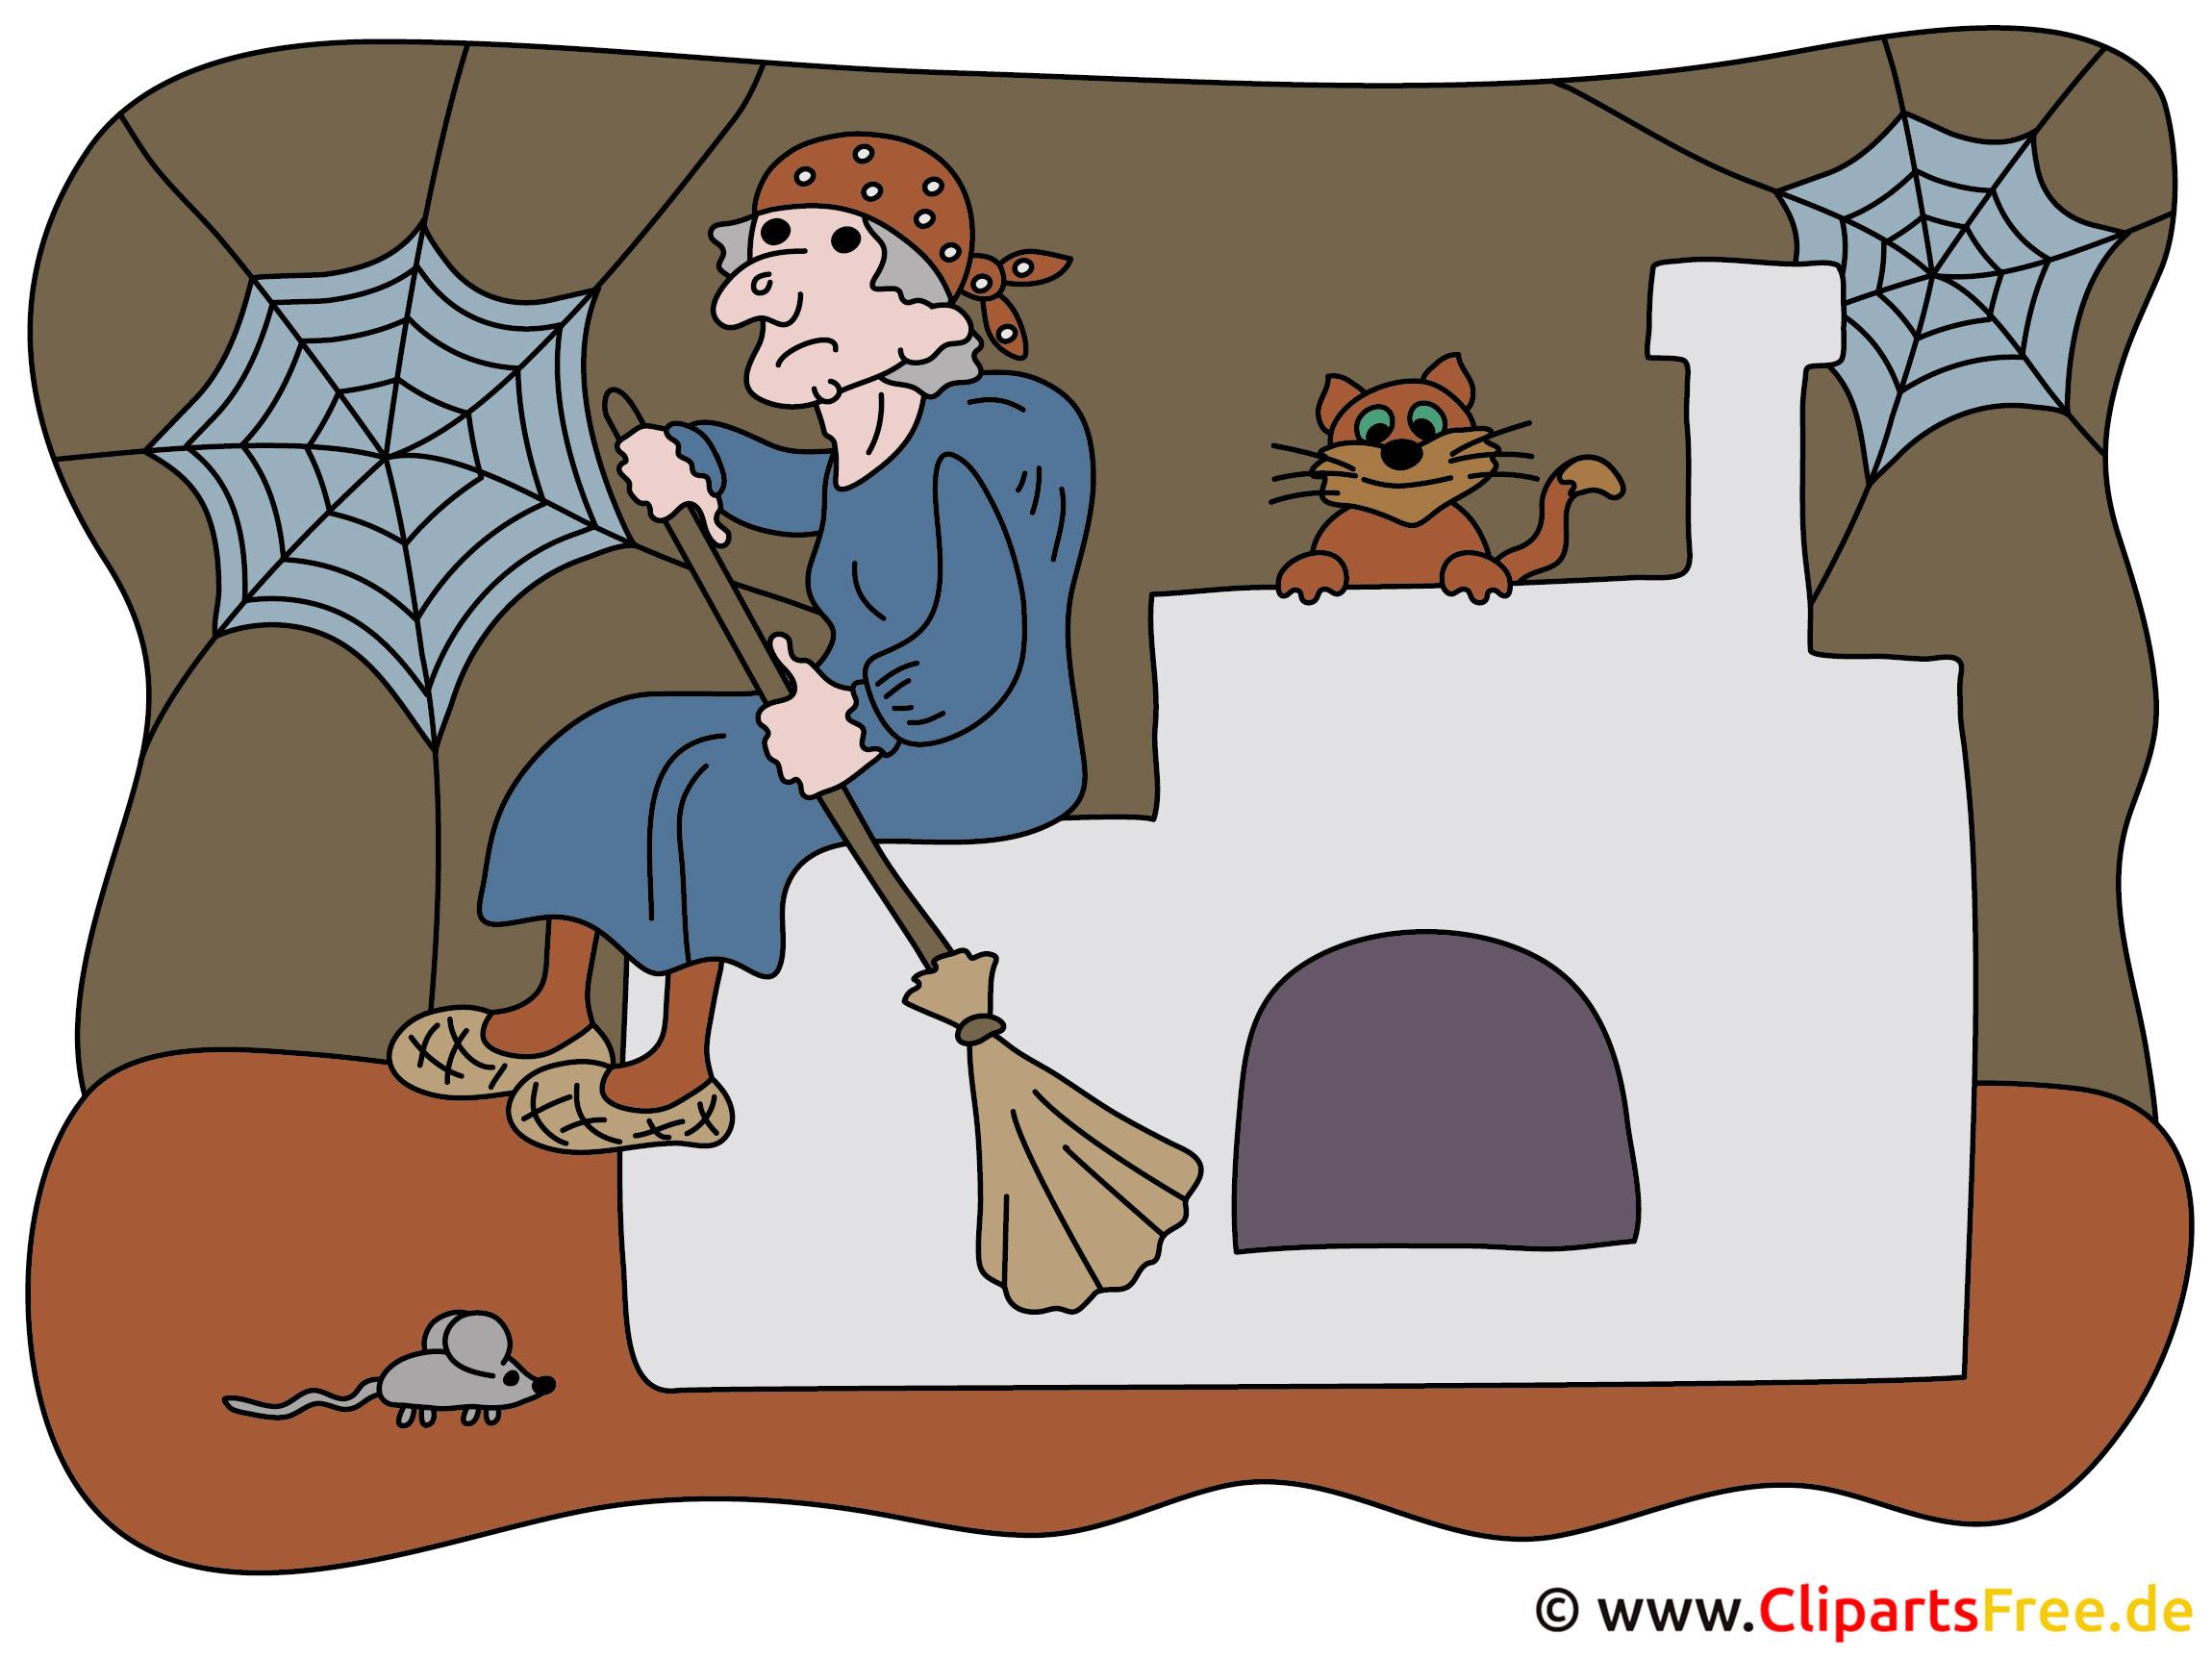 Hexe Cartoon, Illustration zu Märchen